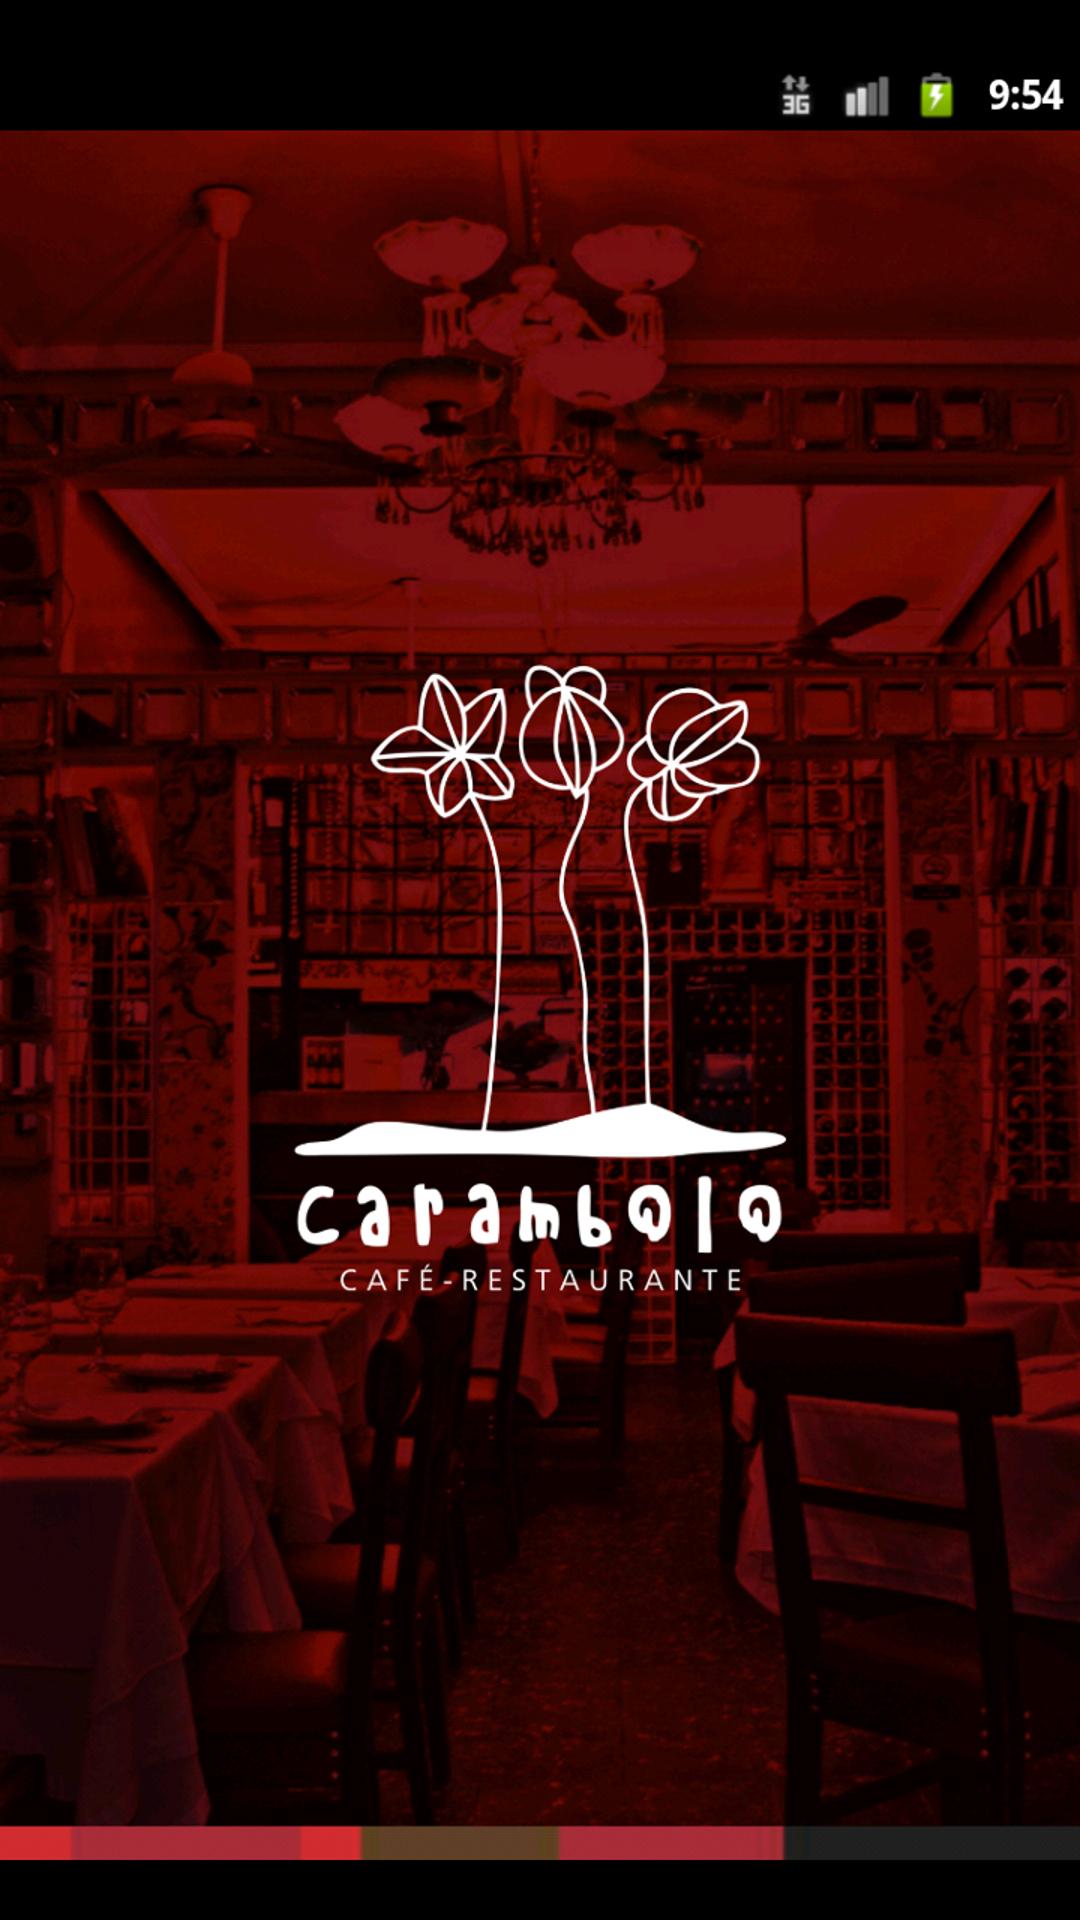 Amazon.com: Carambolo: Appstore for Android